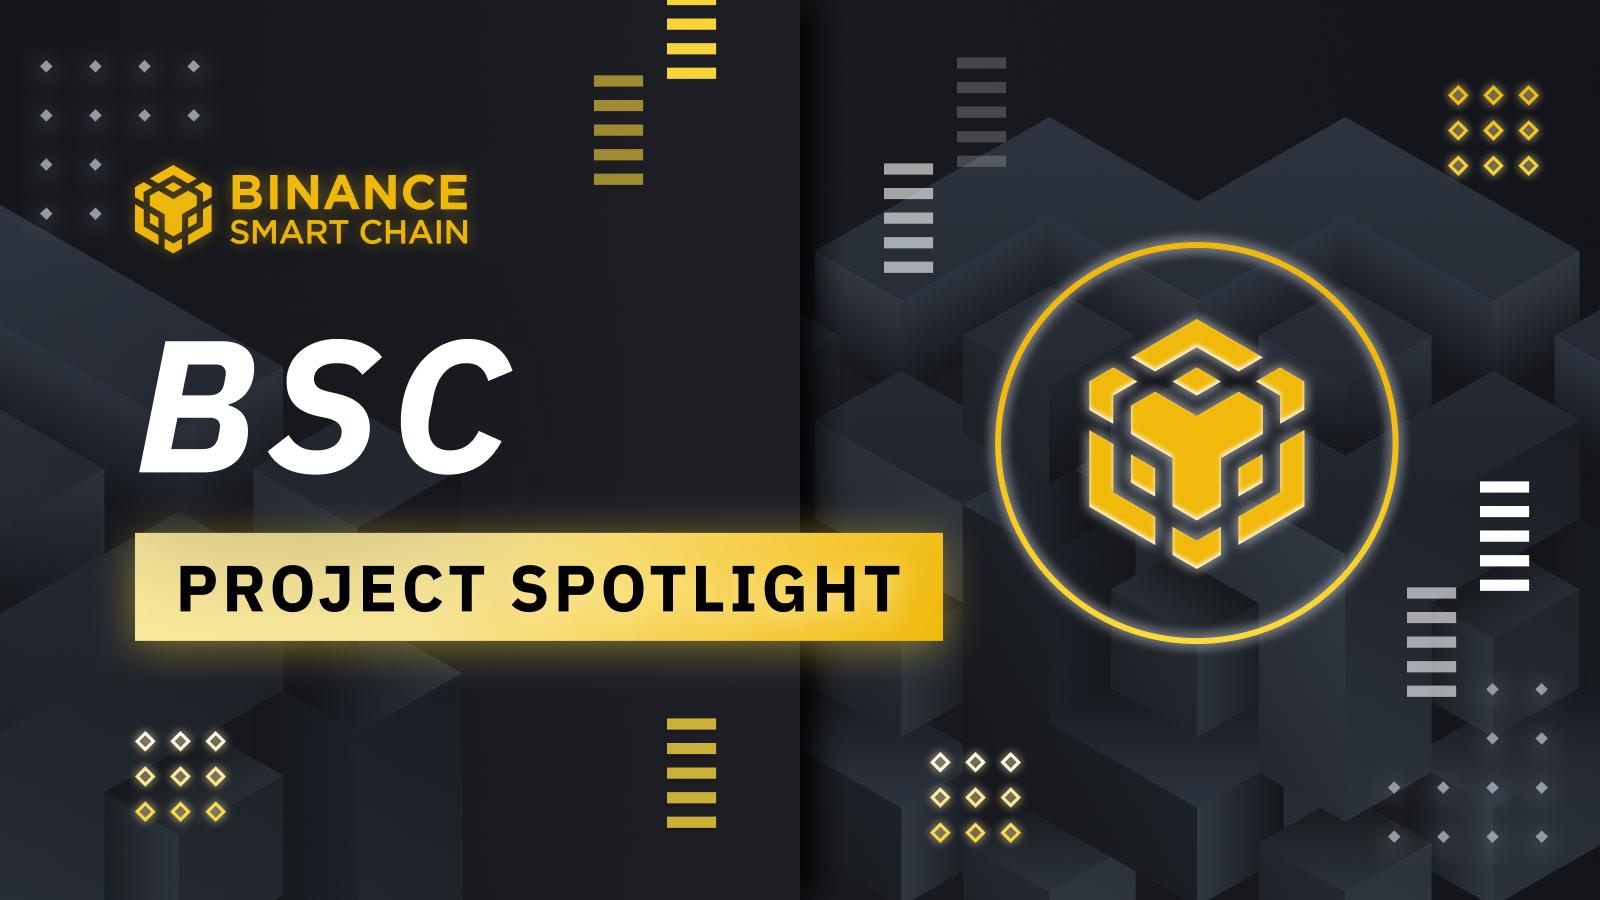 BSC 項目聚焦:Featured by Binance